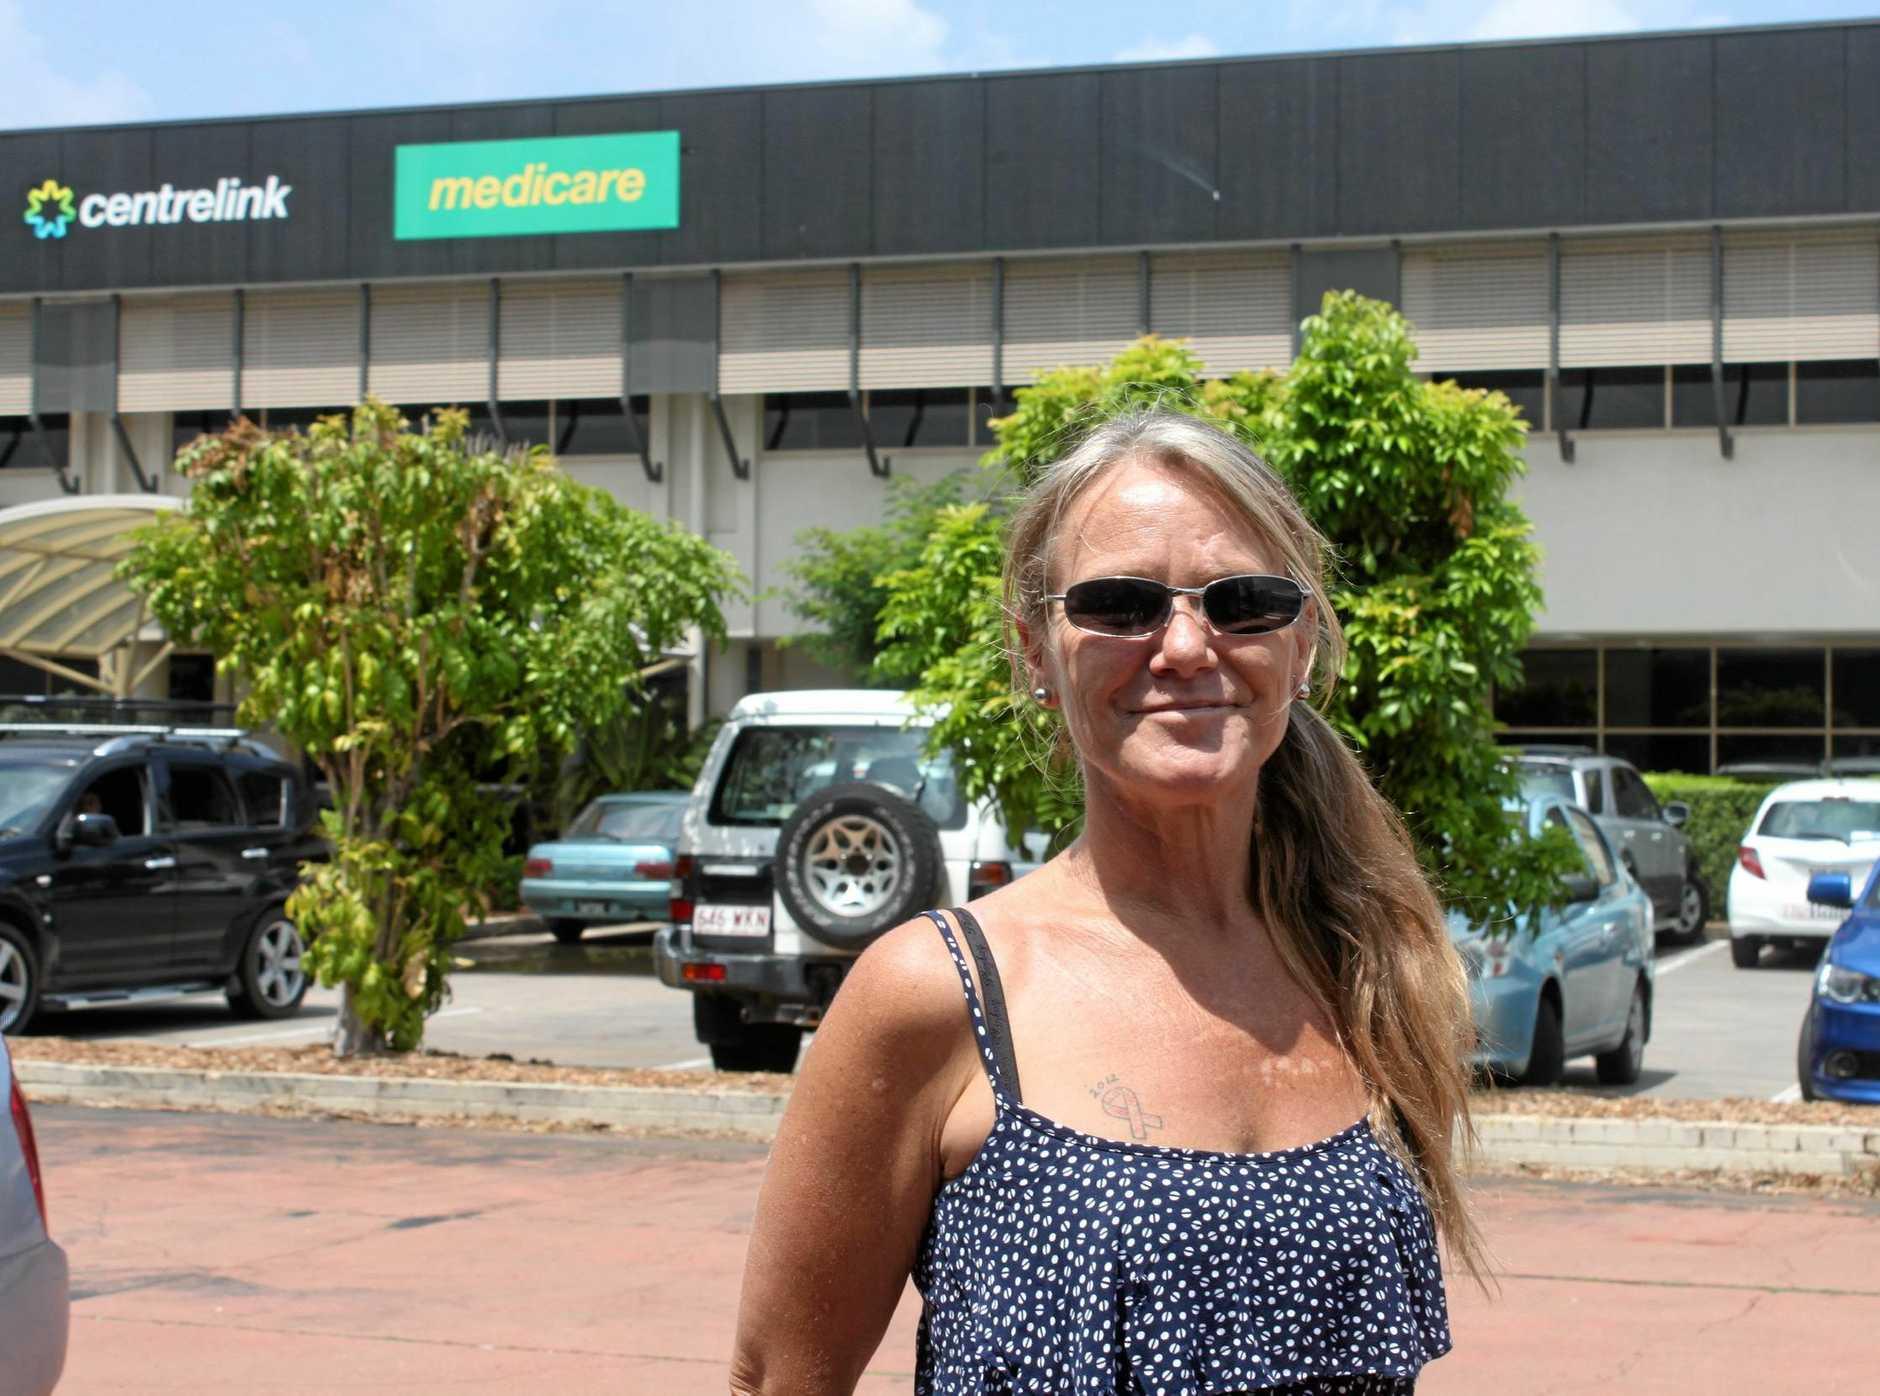 ADANI EXCITEMENT: Rockhampton local Jo Boyd says Adani FIFO jobs are great news for the region.